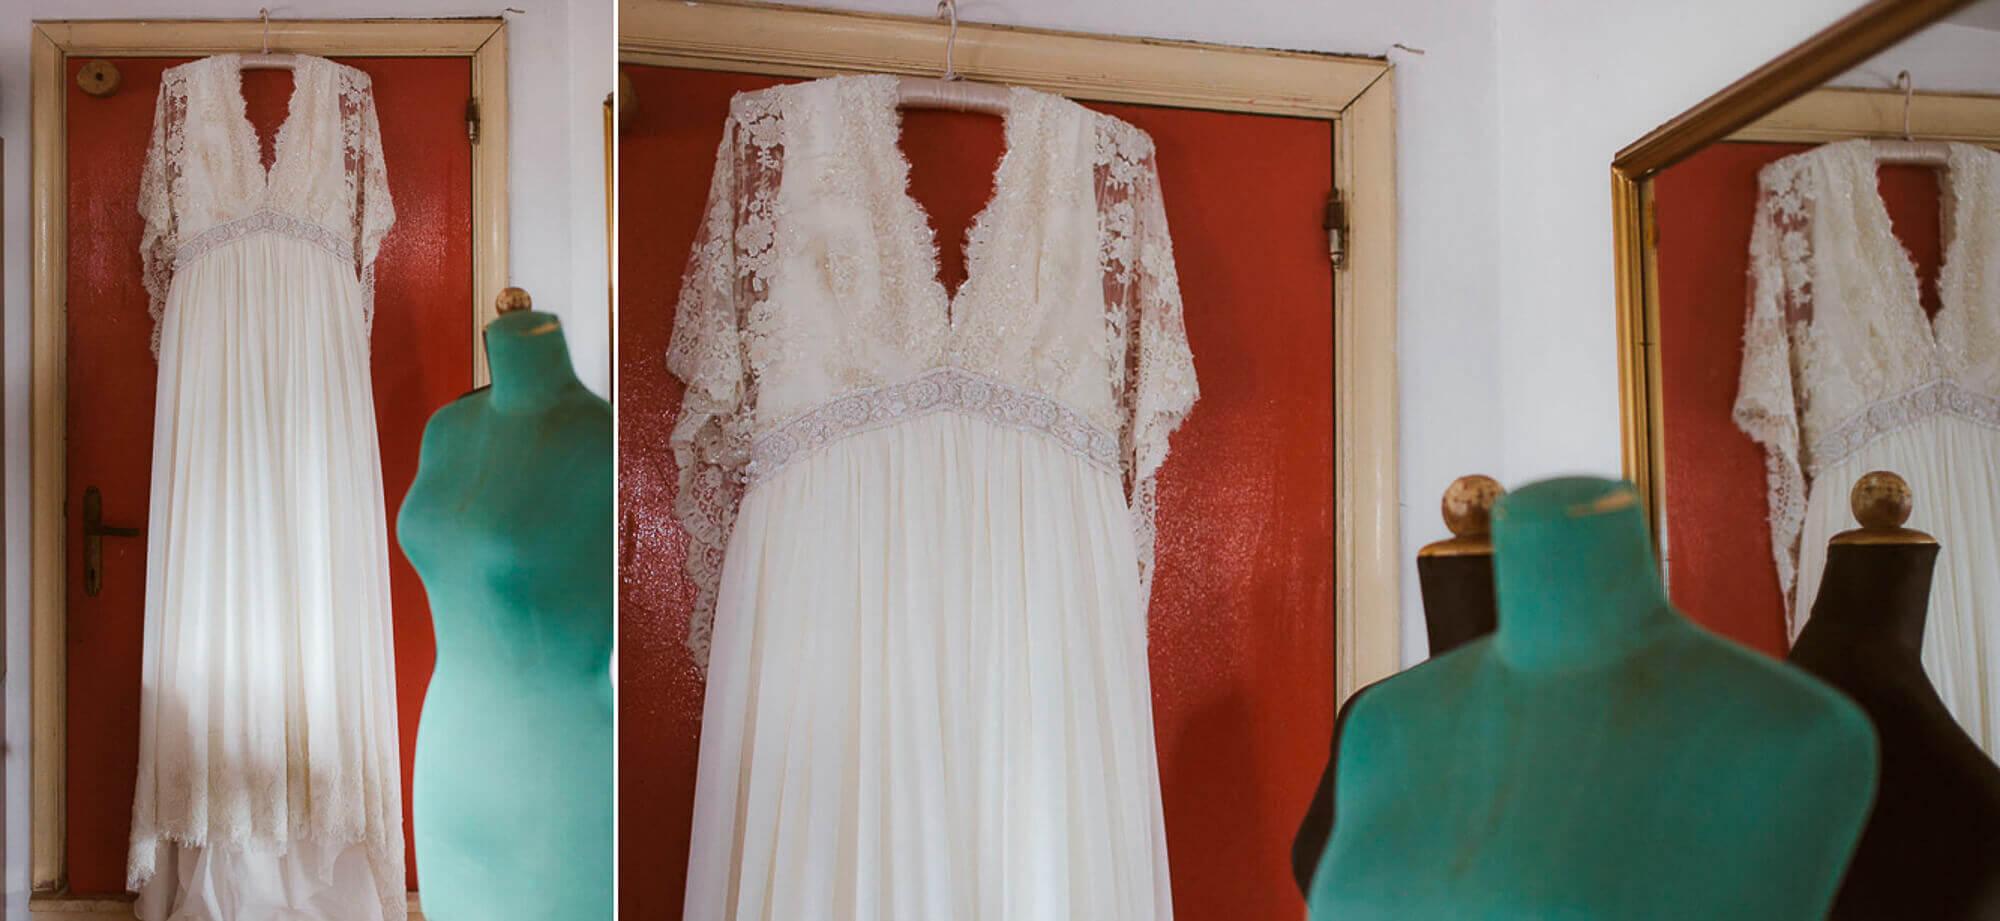 8_wedding_bride_dress.jpg